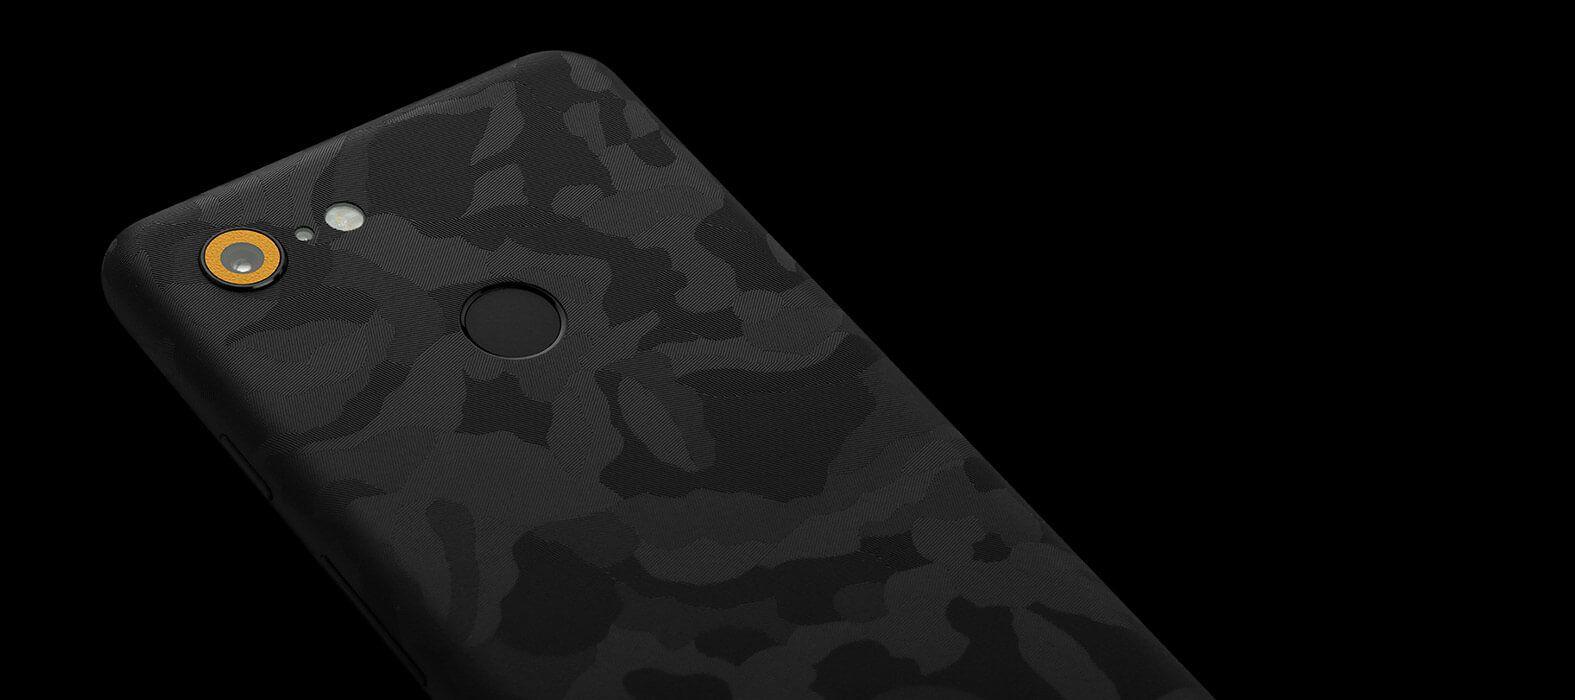 Pixel-3-XL_Black-Camo_Skins